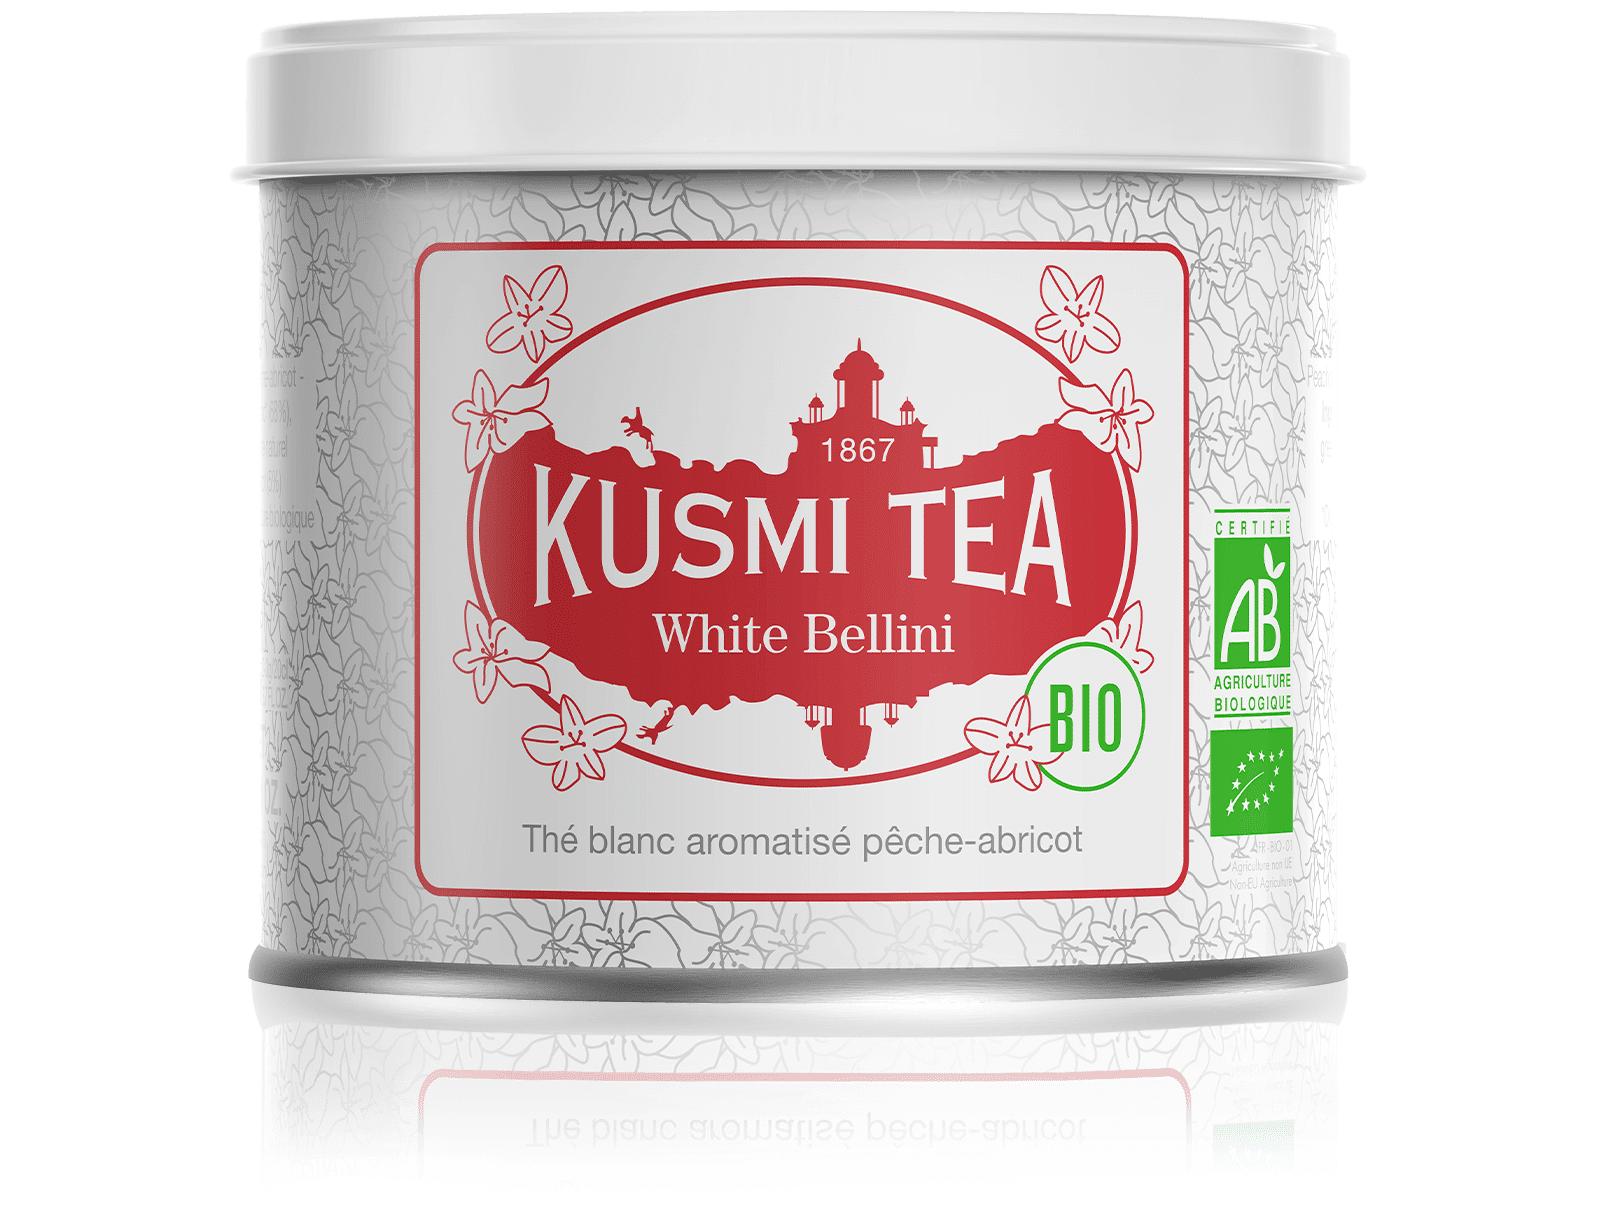 KUSMI TEA White Bellini bio - Thé blanc aromatisé pêche-abricot - Boite à thé en vrac - Kusmi Tea